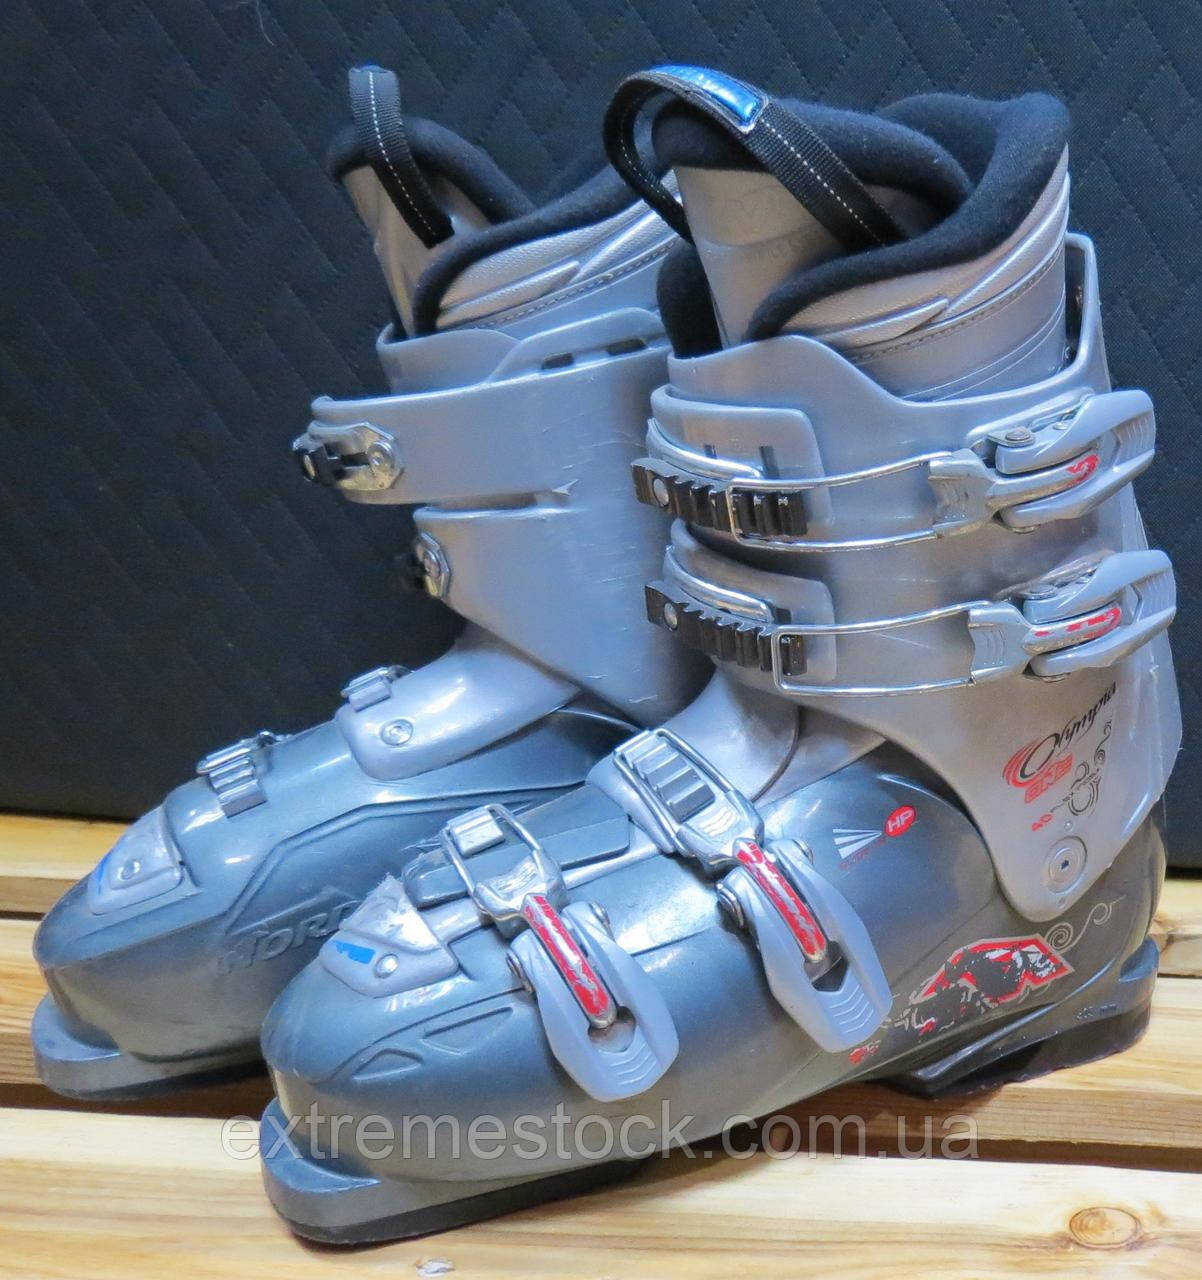 Ботинки лыжные БУ Nordica OLIMPIA 25.5